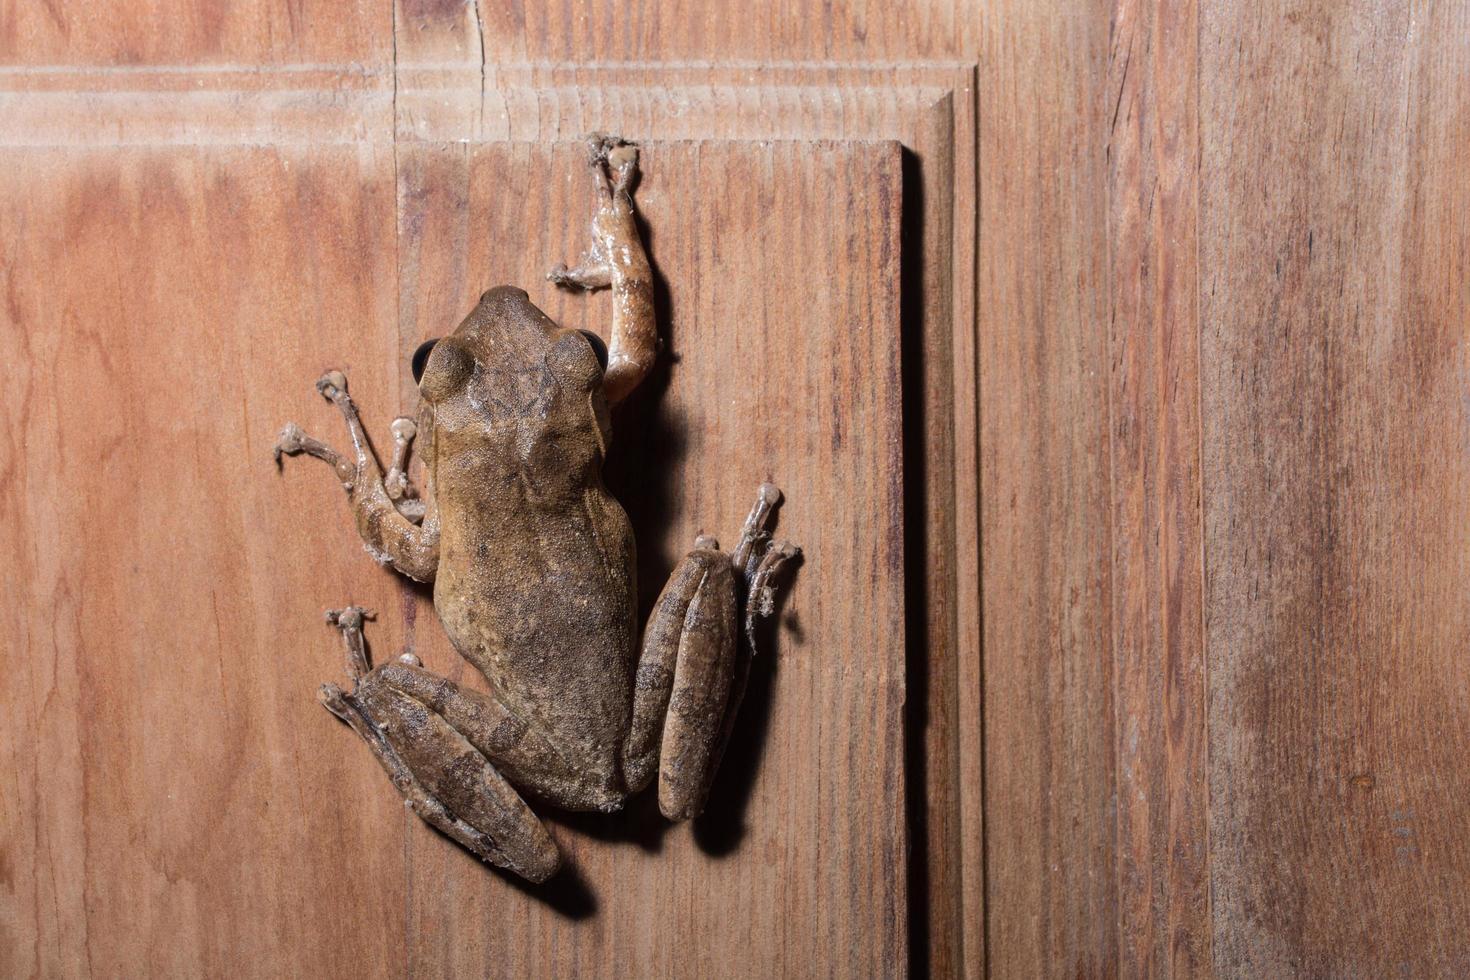 Polypedates leucomystax on wooden background photo